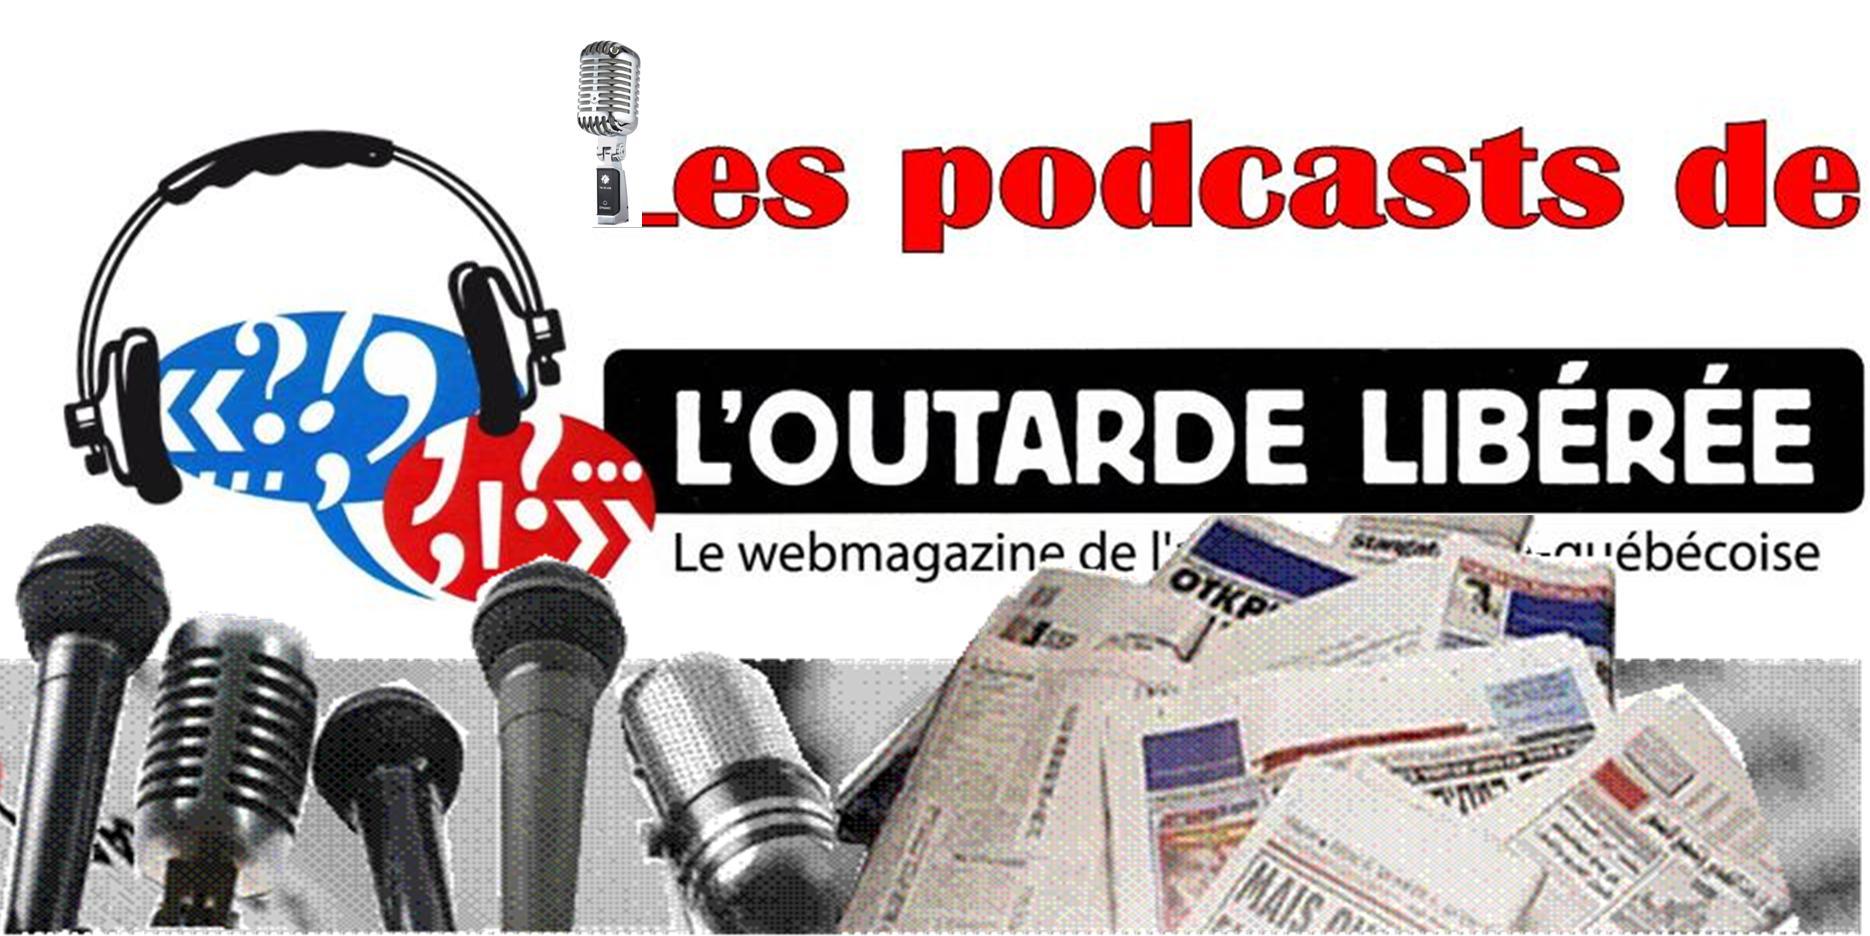 Le podcast de Mars 2016